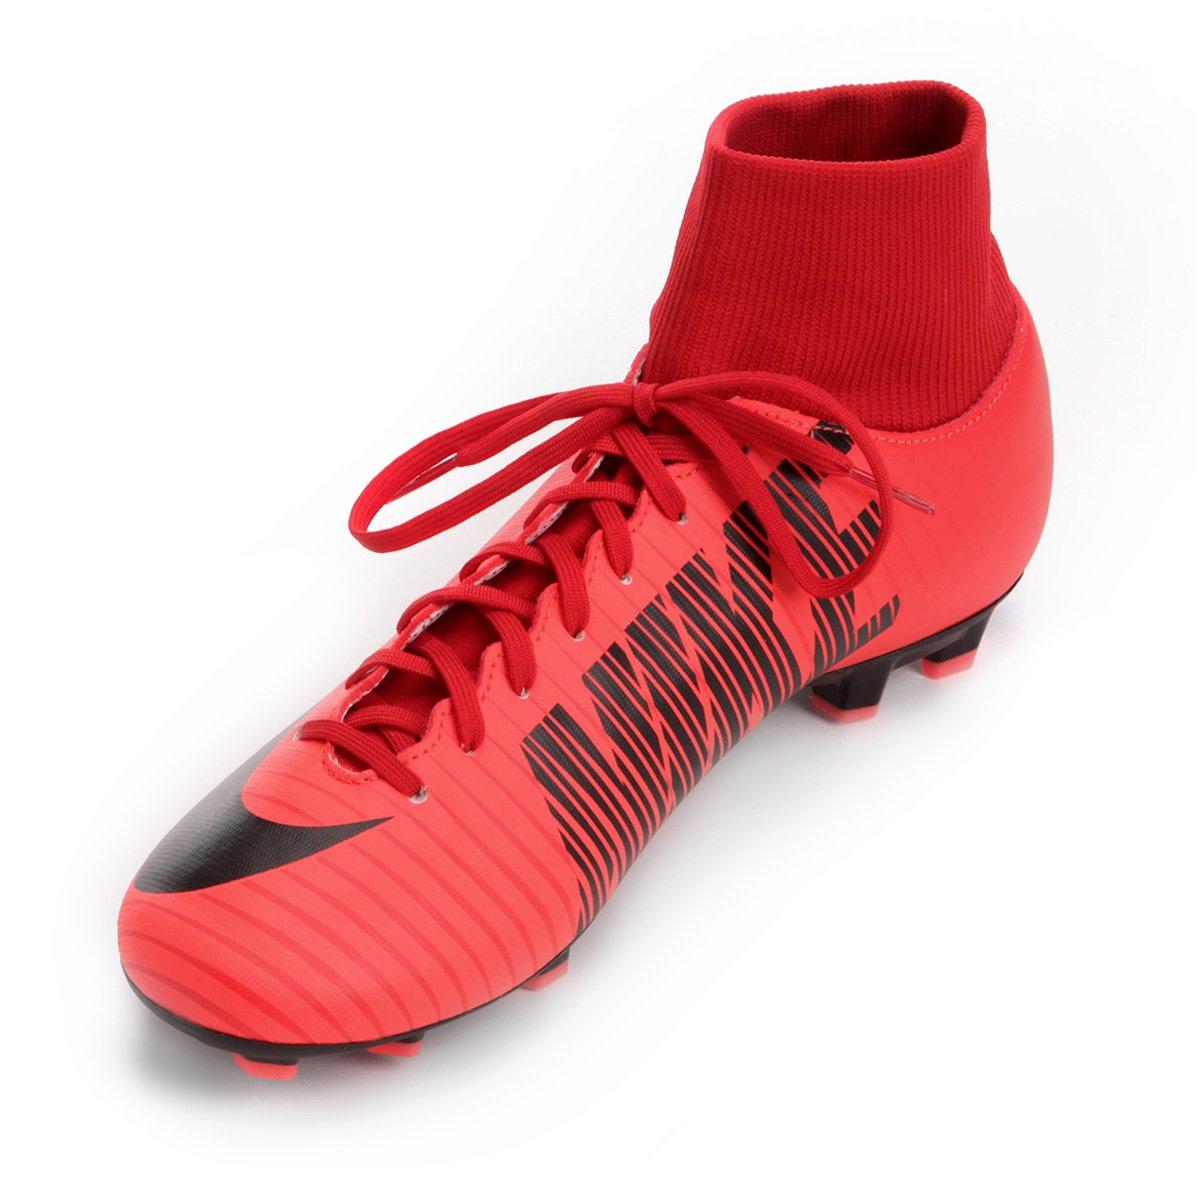 Chuteira Campo Nike Mercurial Victory 6 Dynamic Fit FG Masculina ... 2240ece19dc8a